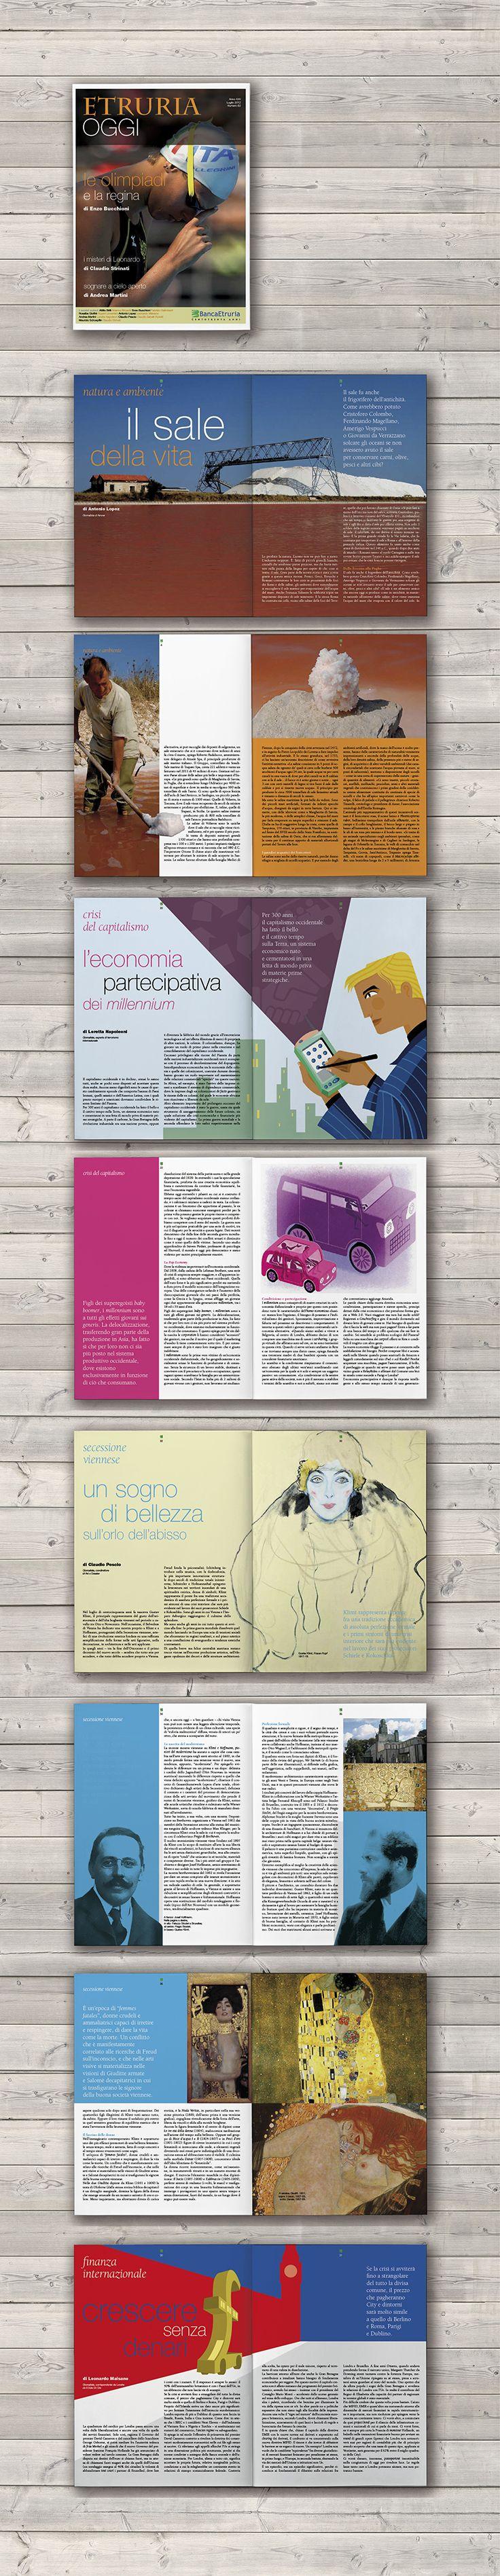 Cover and magazine design / Magazine / Banca Etruria